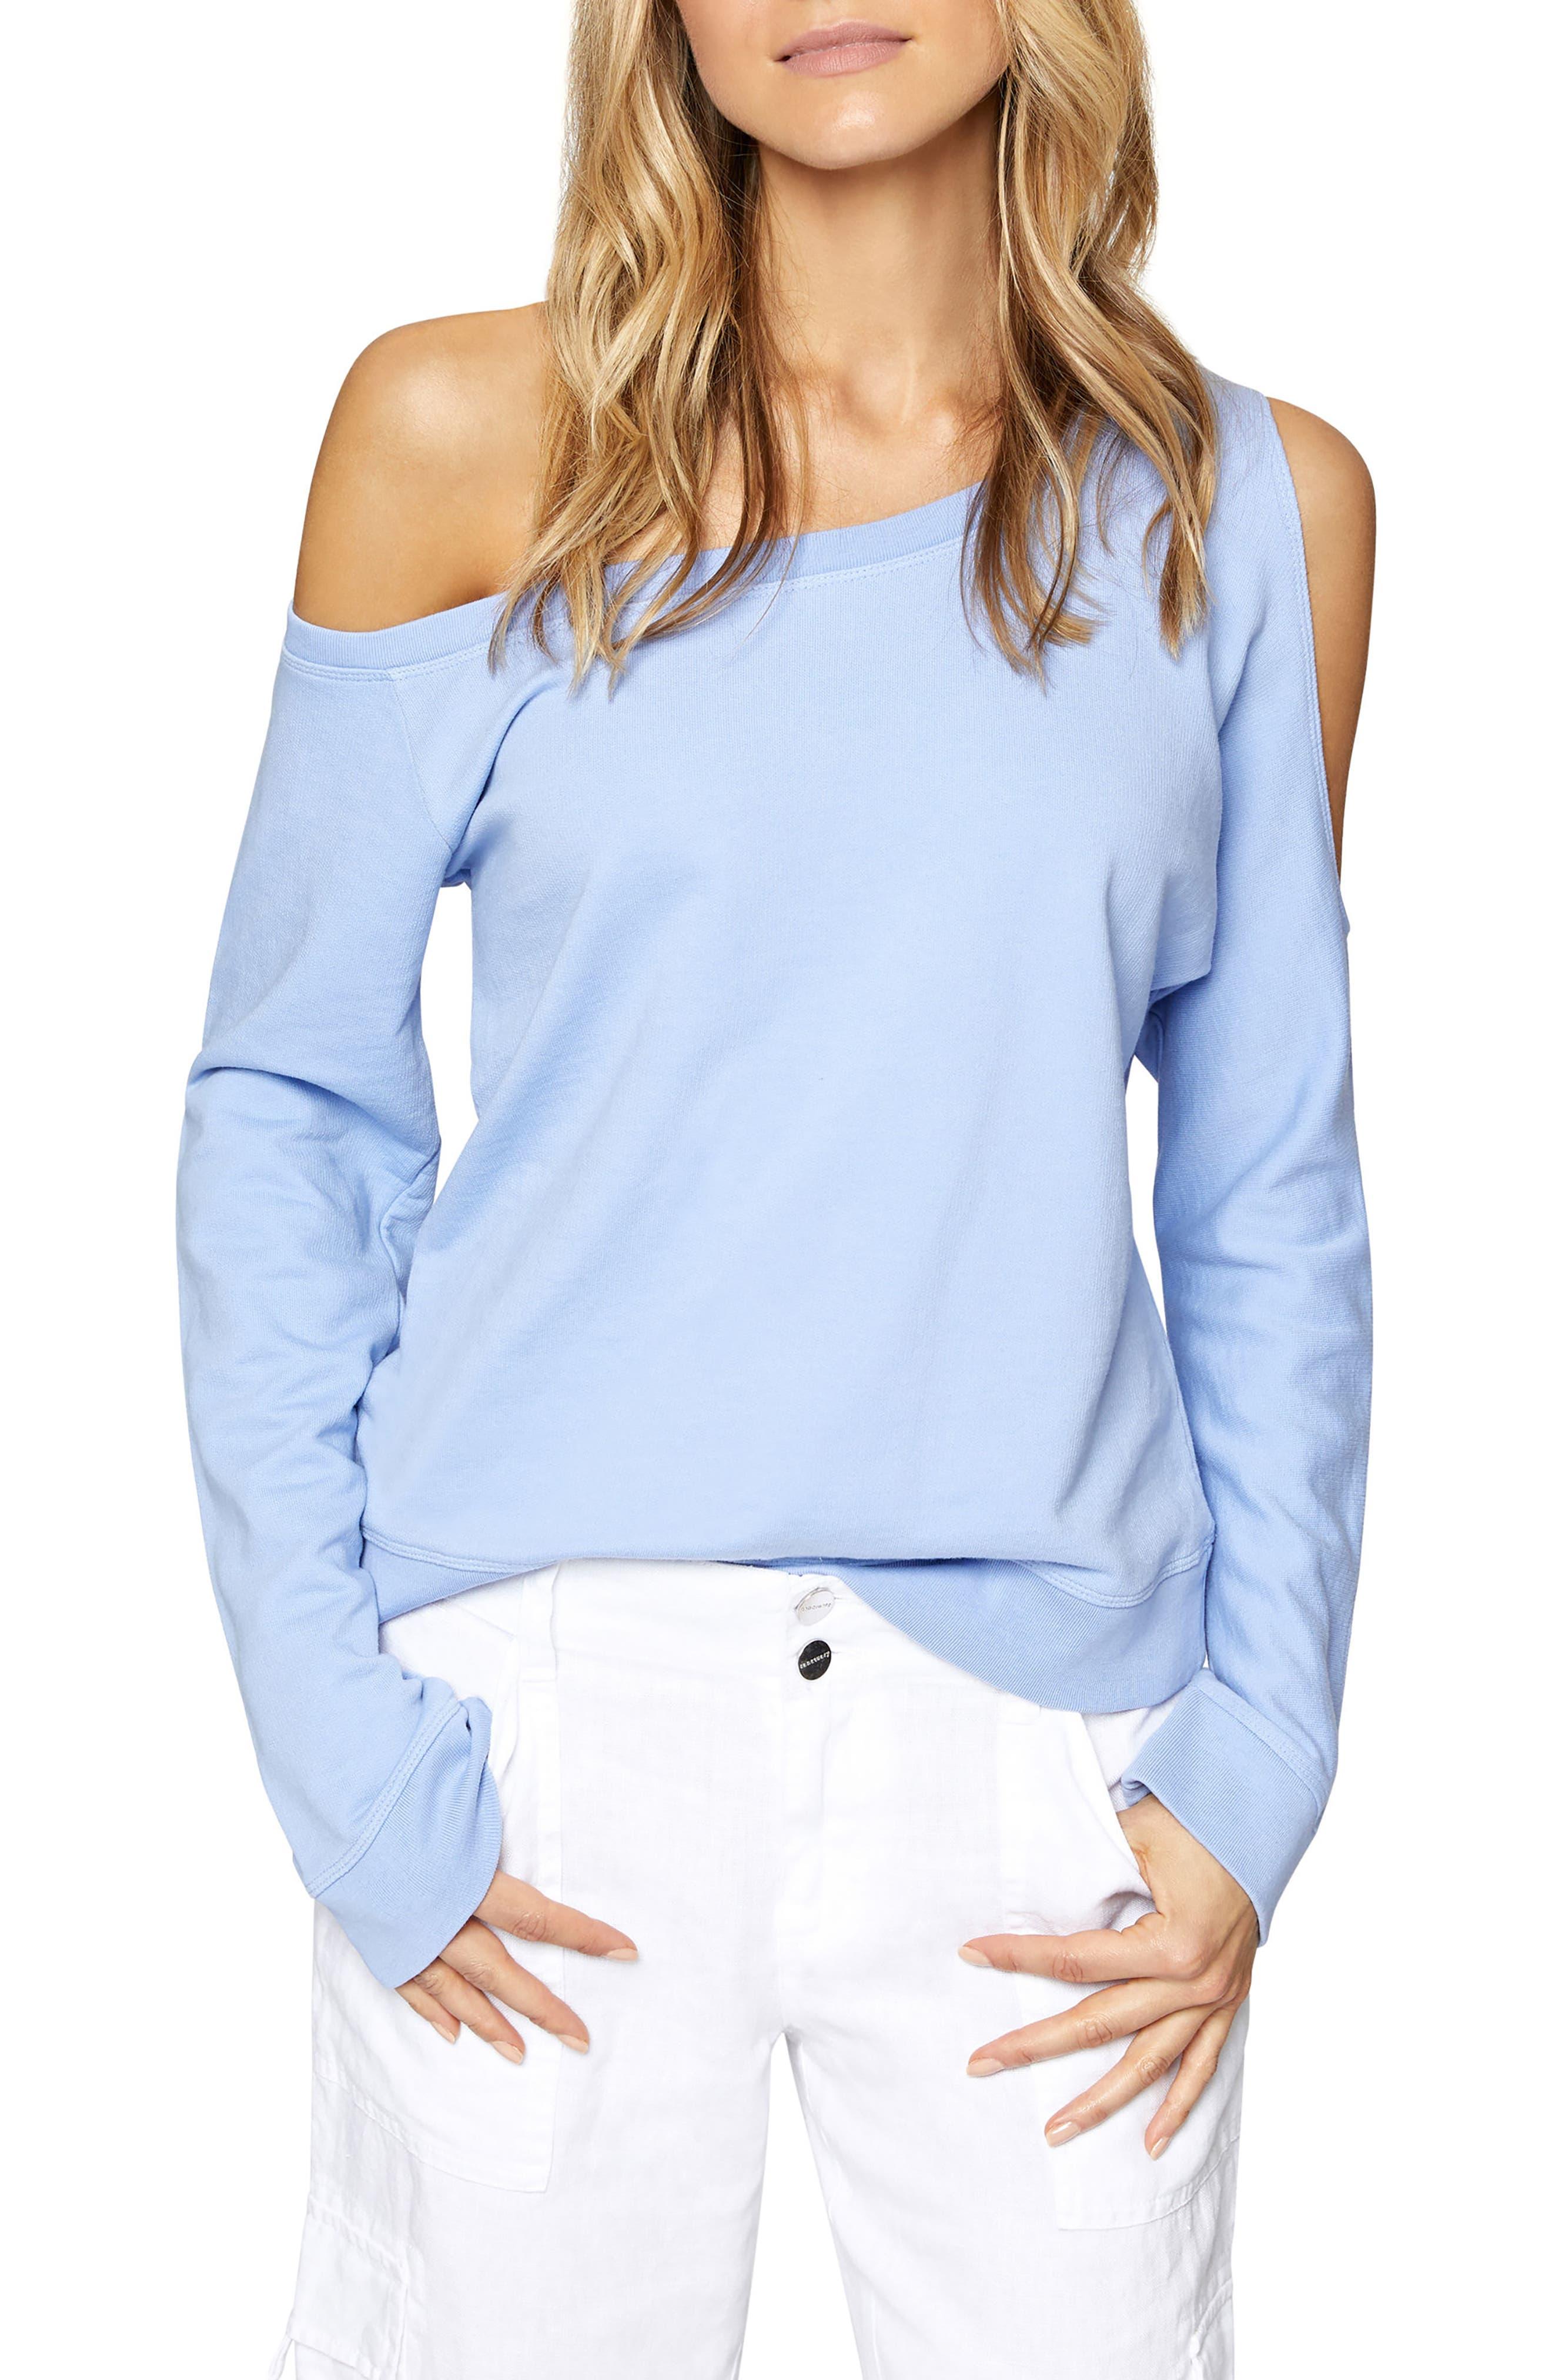 Alexi Asymmetrical Sweatshirt,                         Main,                         color, 450